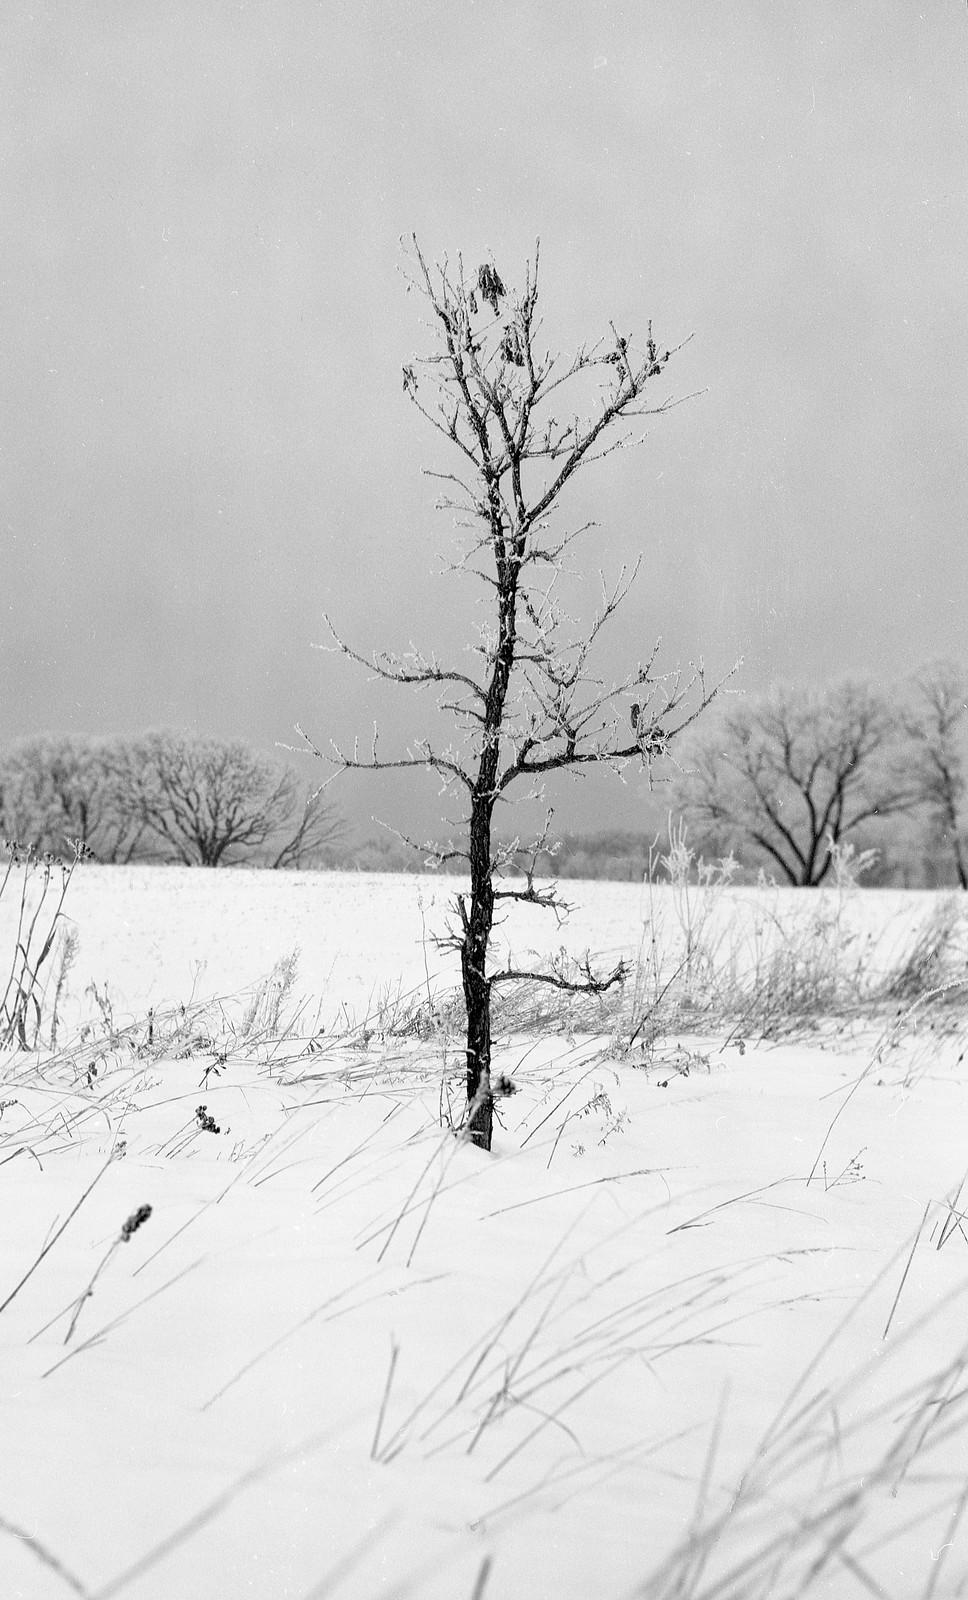 Frosty Morning Photos [Horseman 985 / Arista EDU Ultra 400 / Clayton F76+]